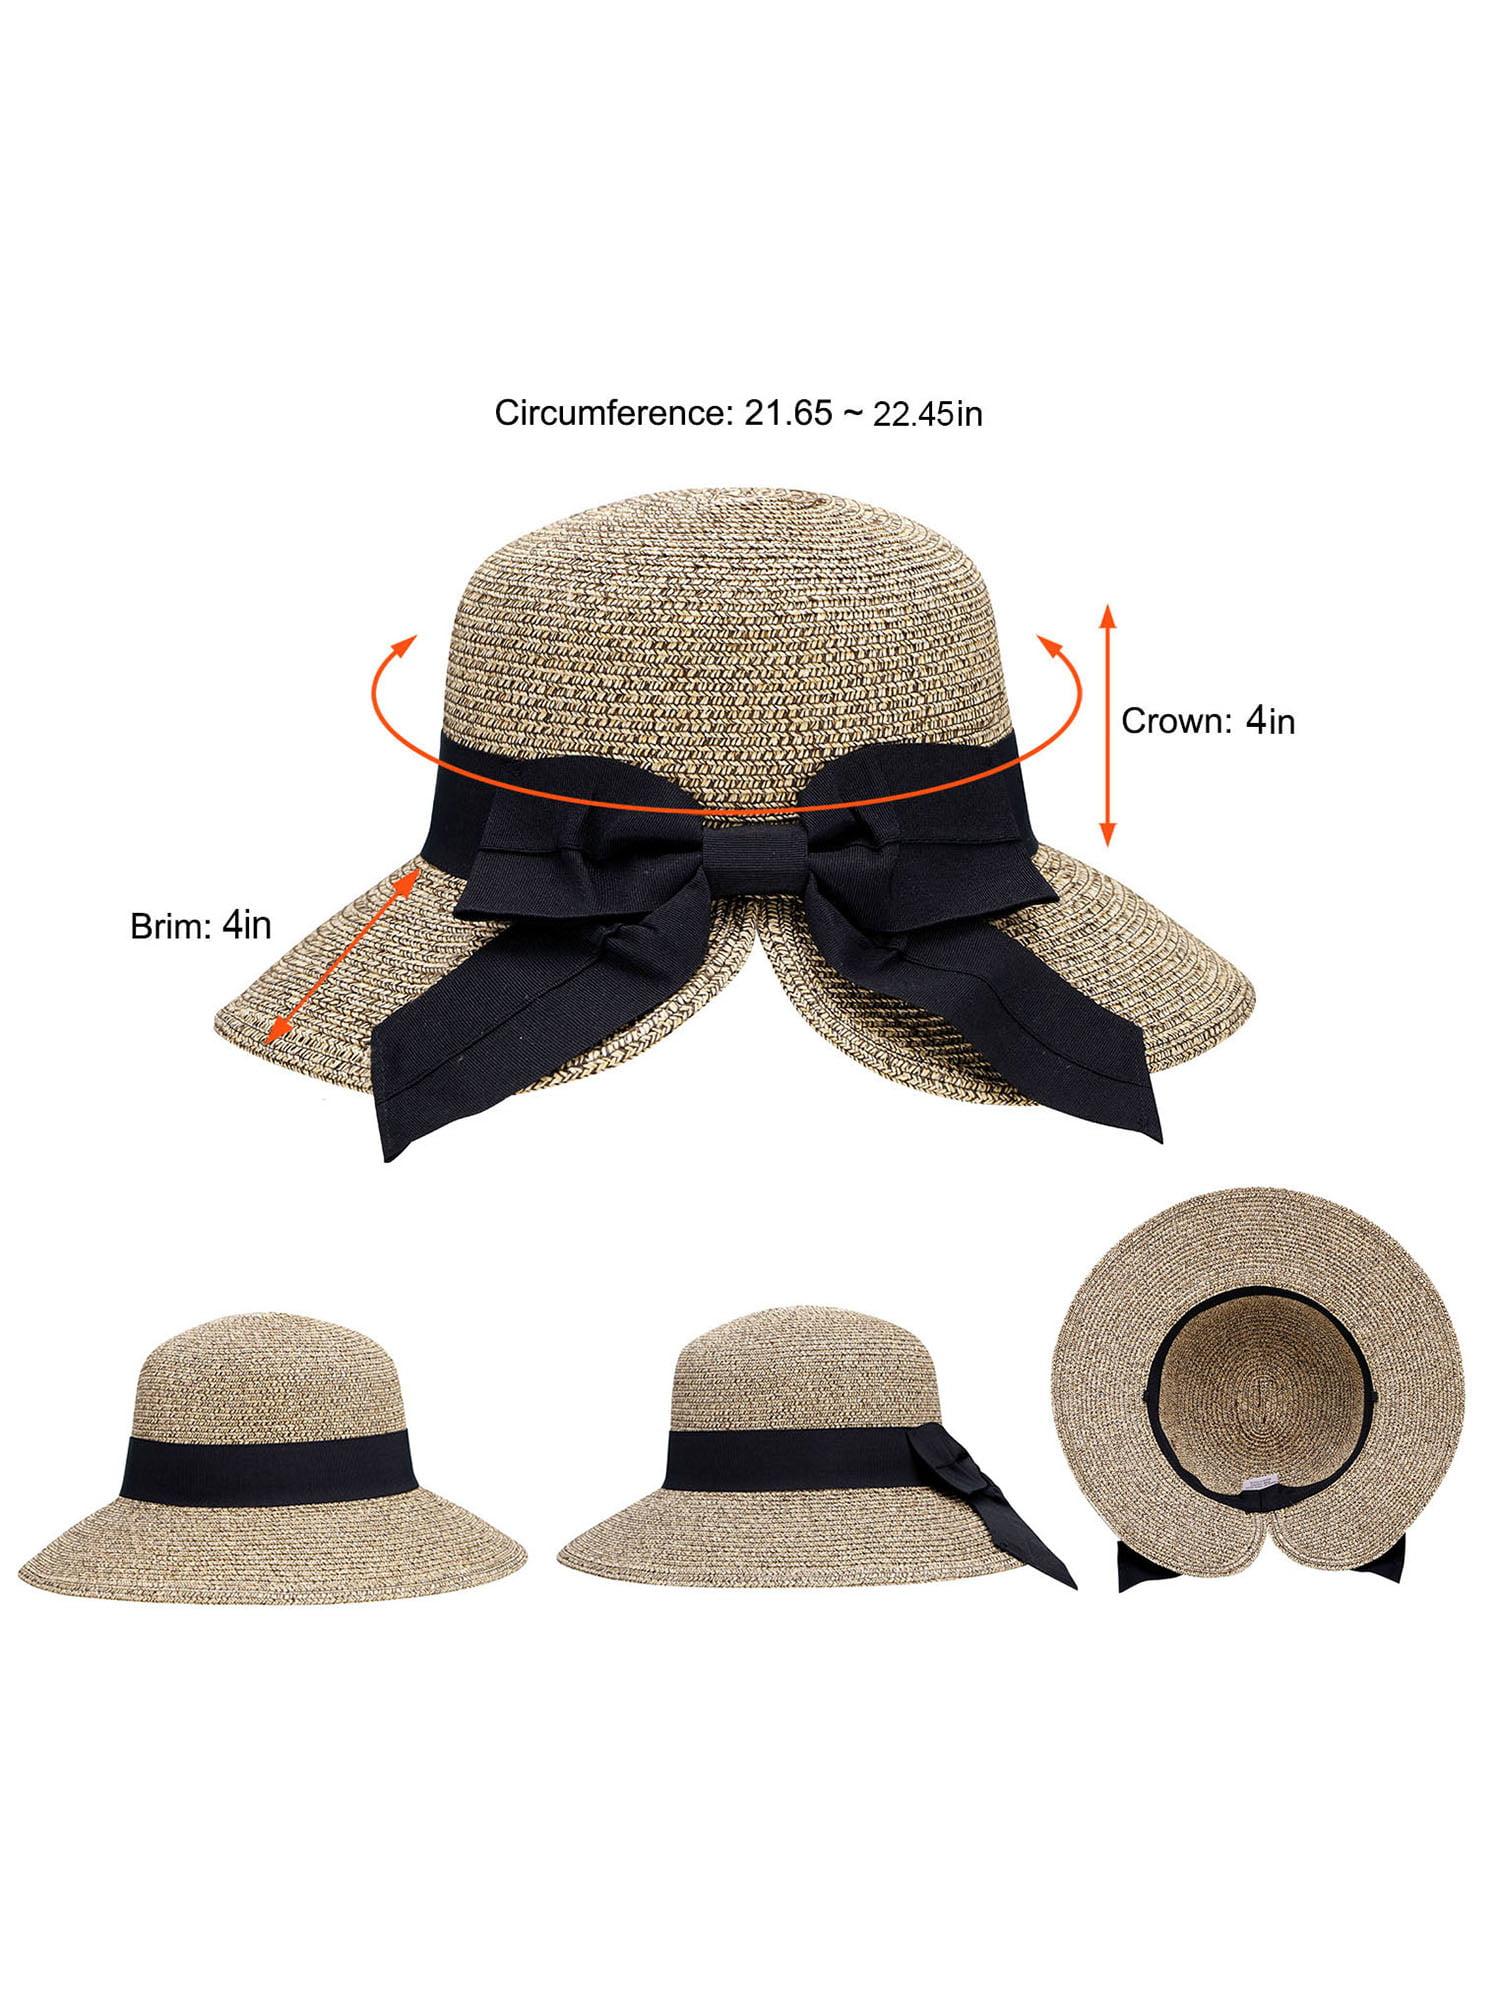 Women Reversible Embroidery Wide Brim Caps Packable Floppy Beach Sun Hats-Multi Patterns SINLOOG Bucket Hats